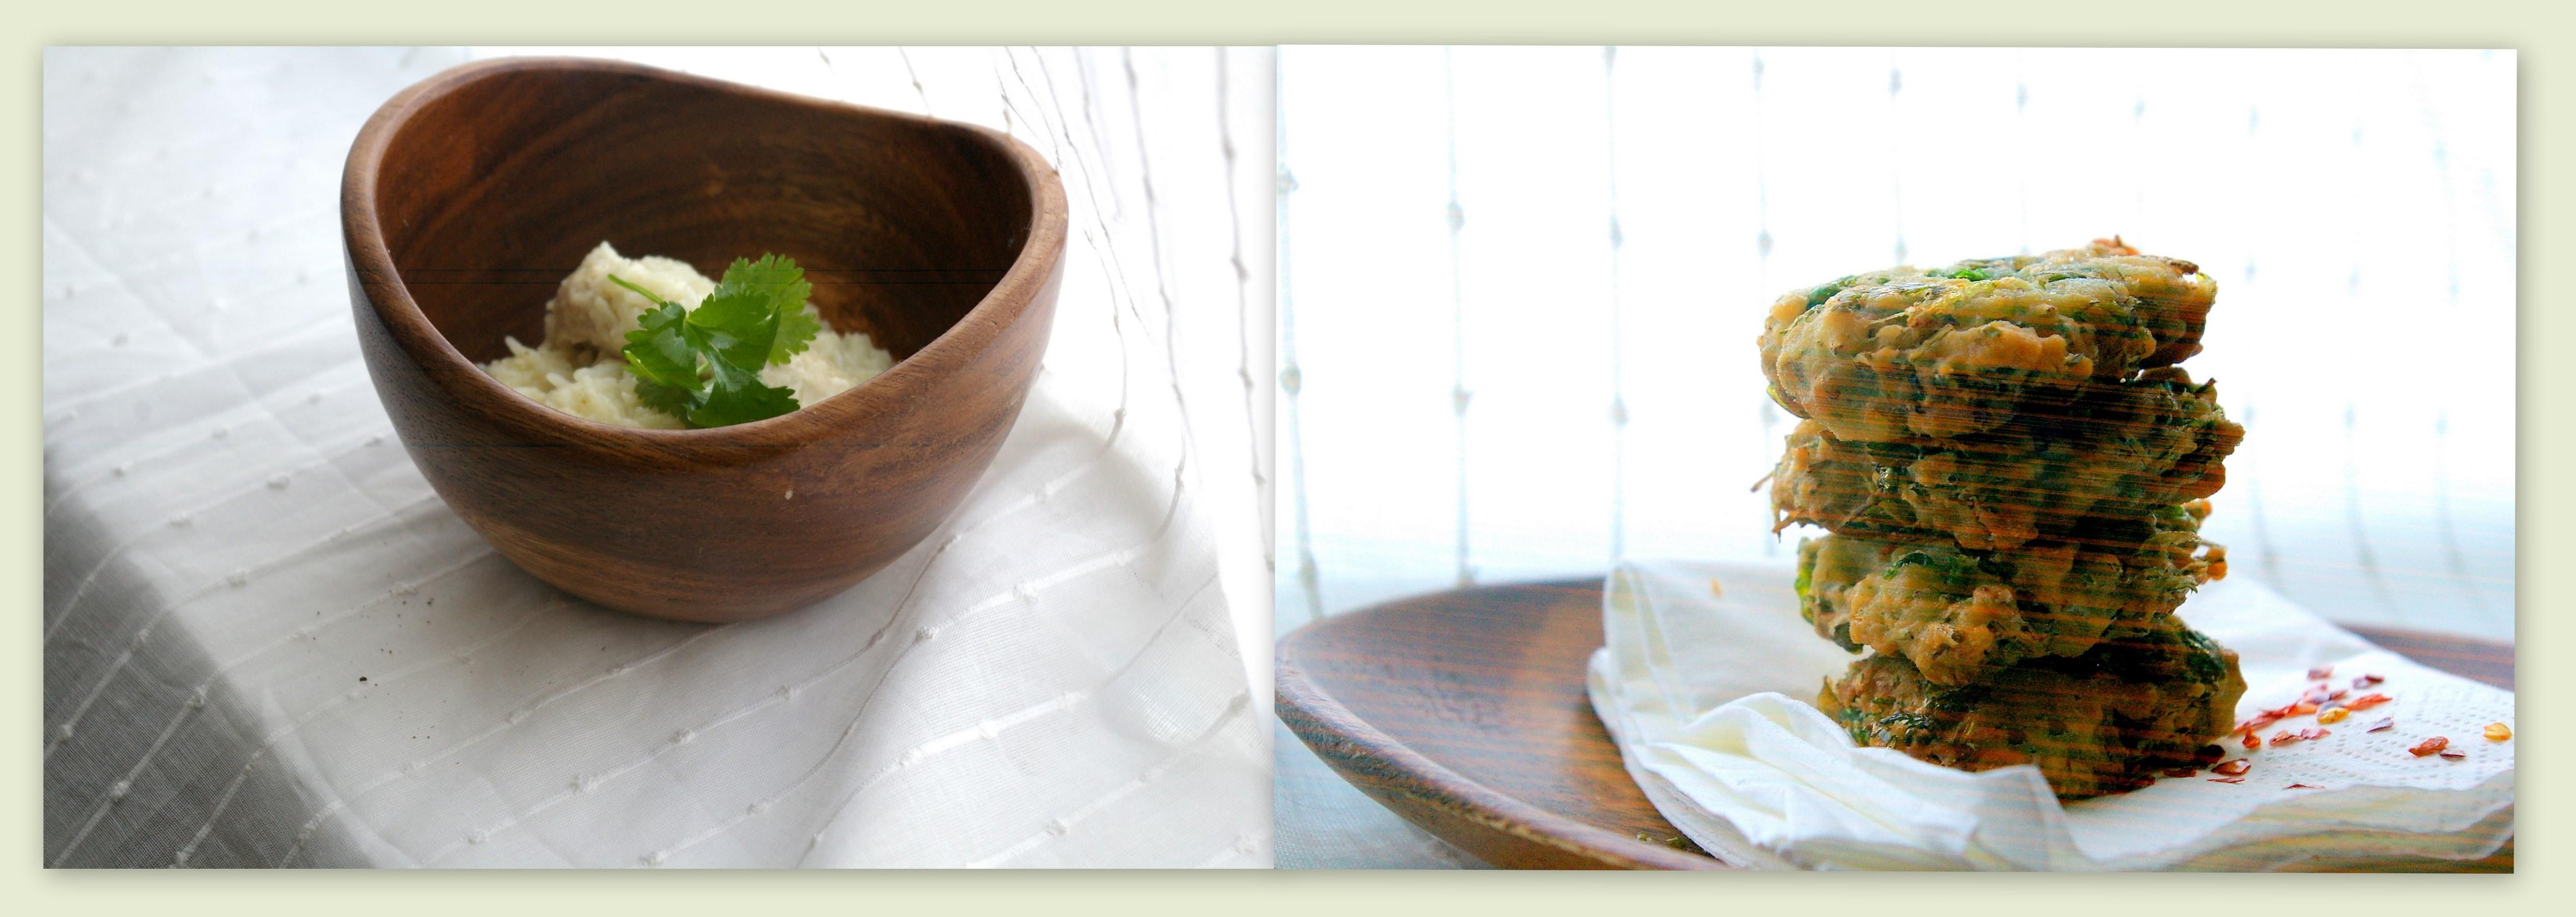 Chicken & Lemongrass Rice with Coriander Fritters